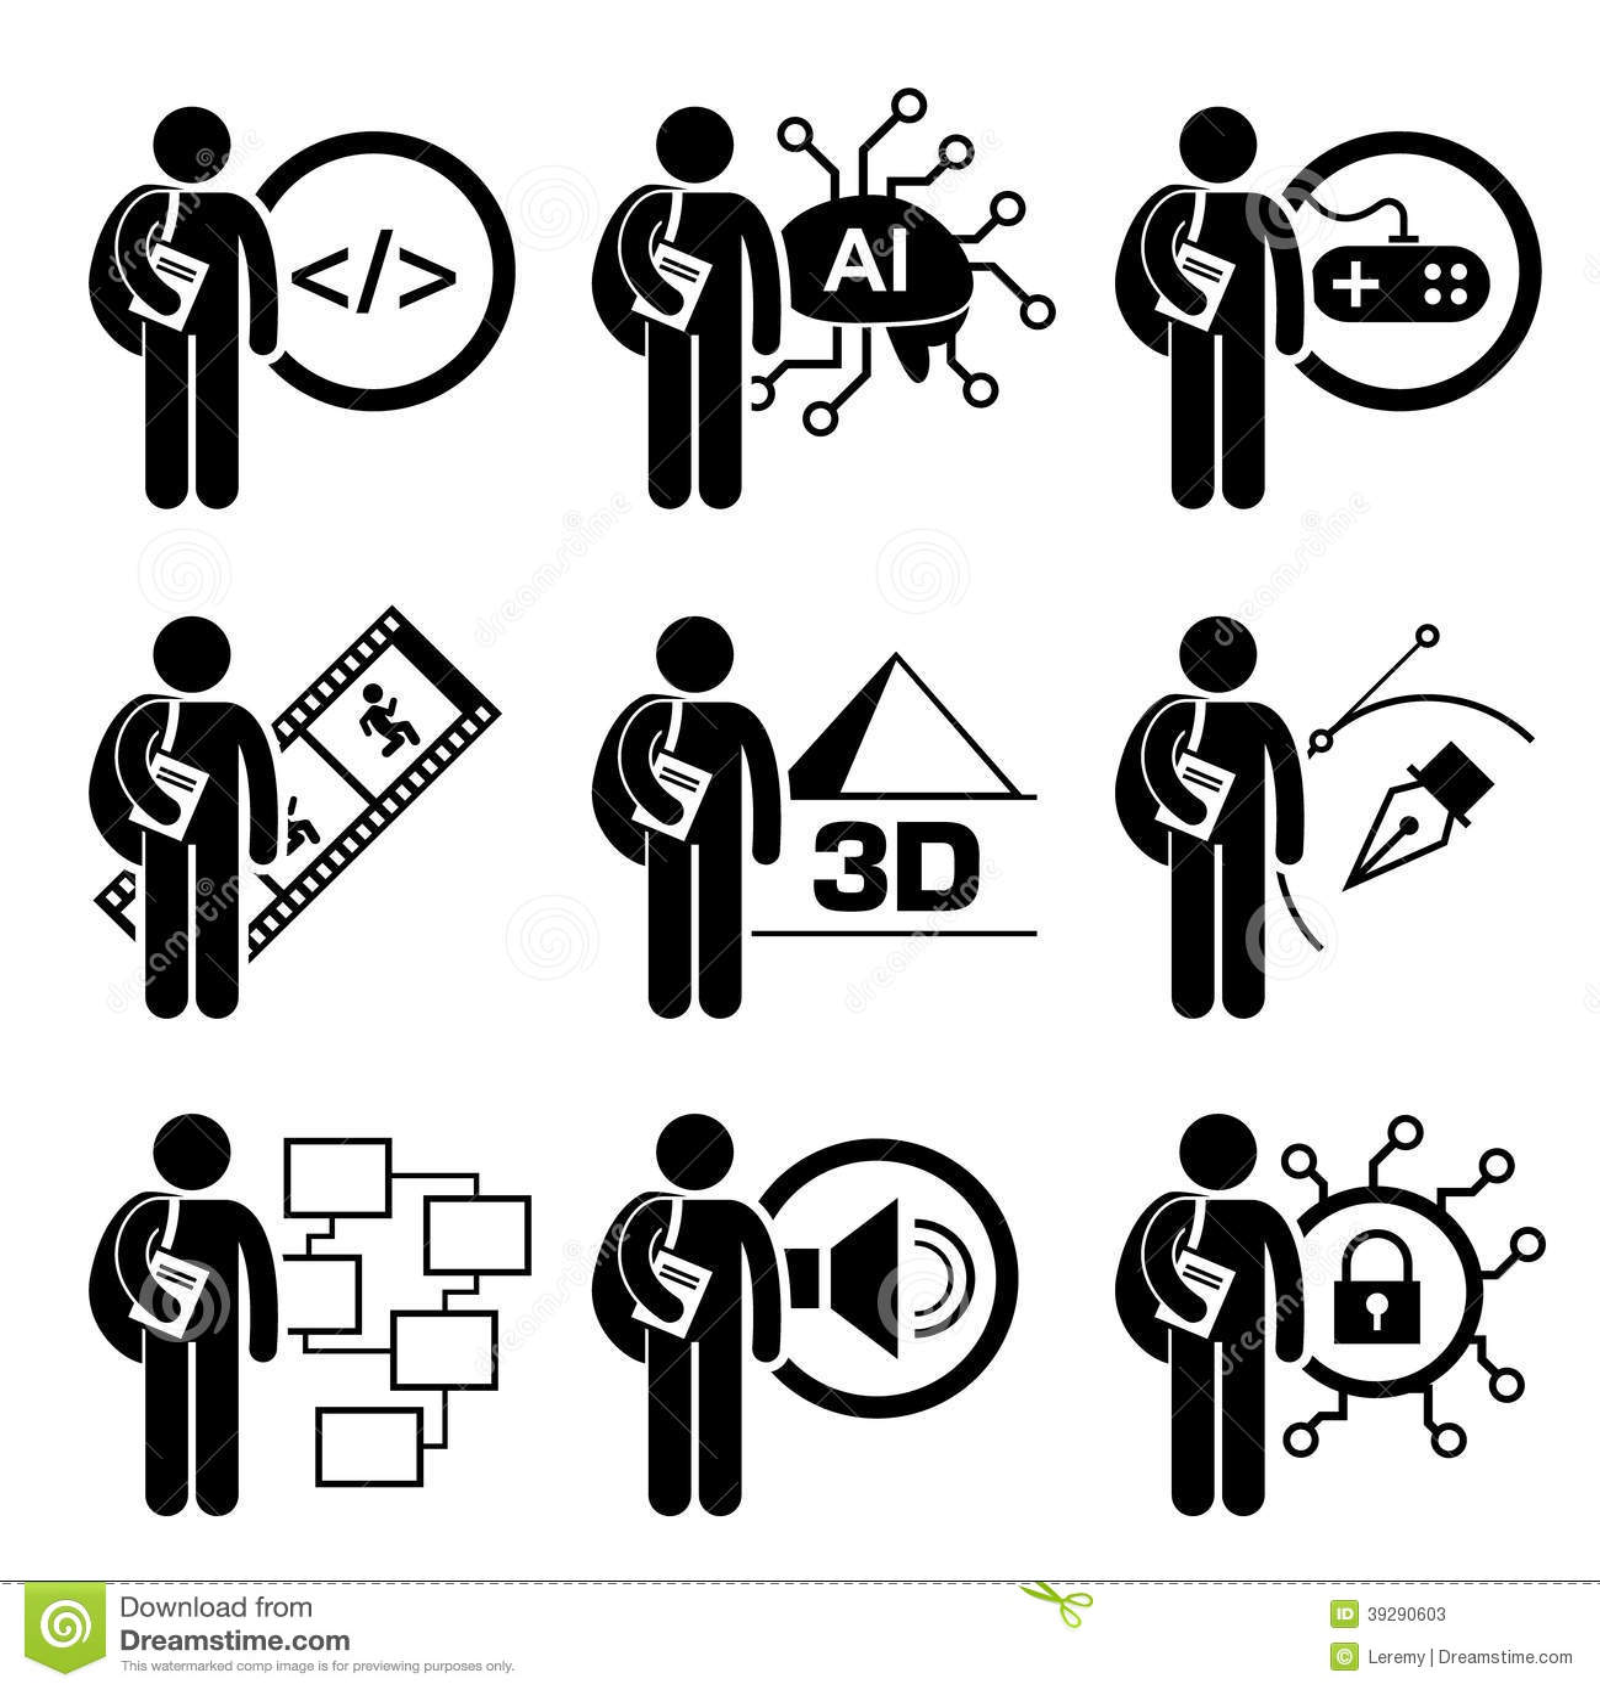 Etudiant Degree En Technologie De L Information